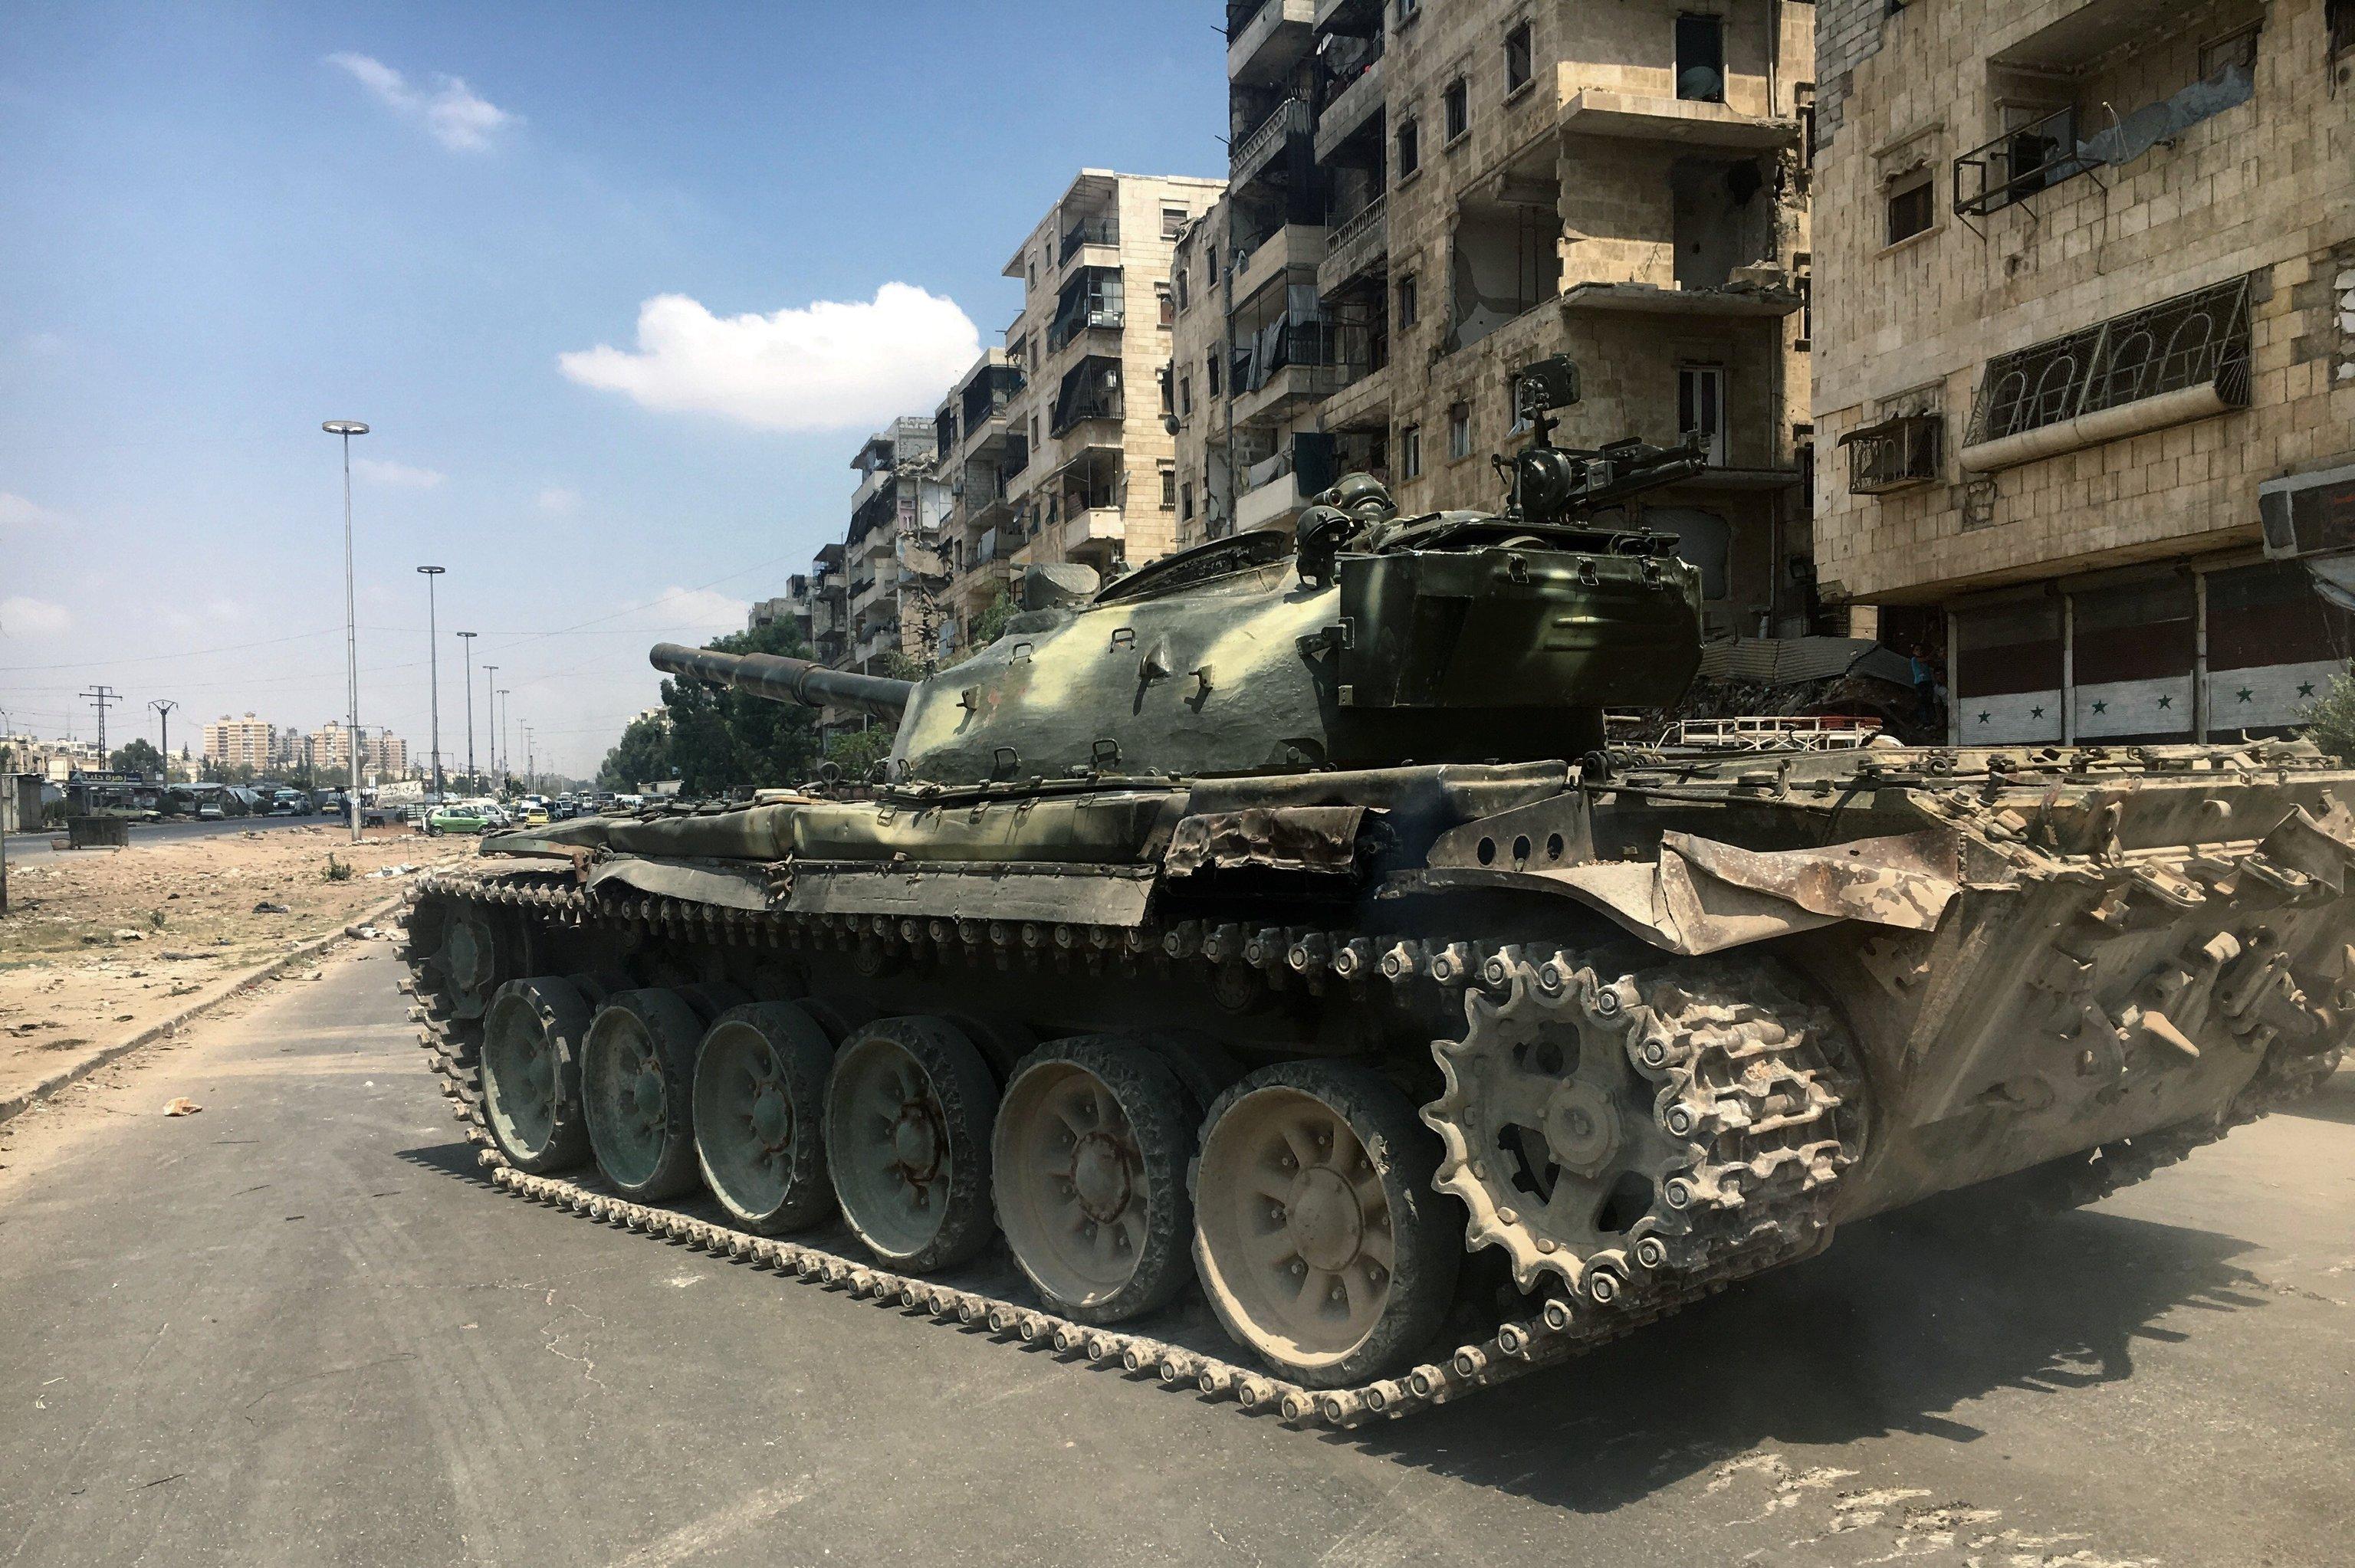 Syria: Suspected Chlorine Gas Attack In Aleppo